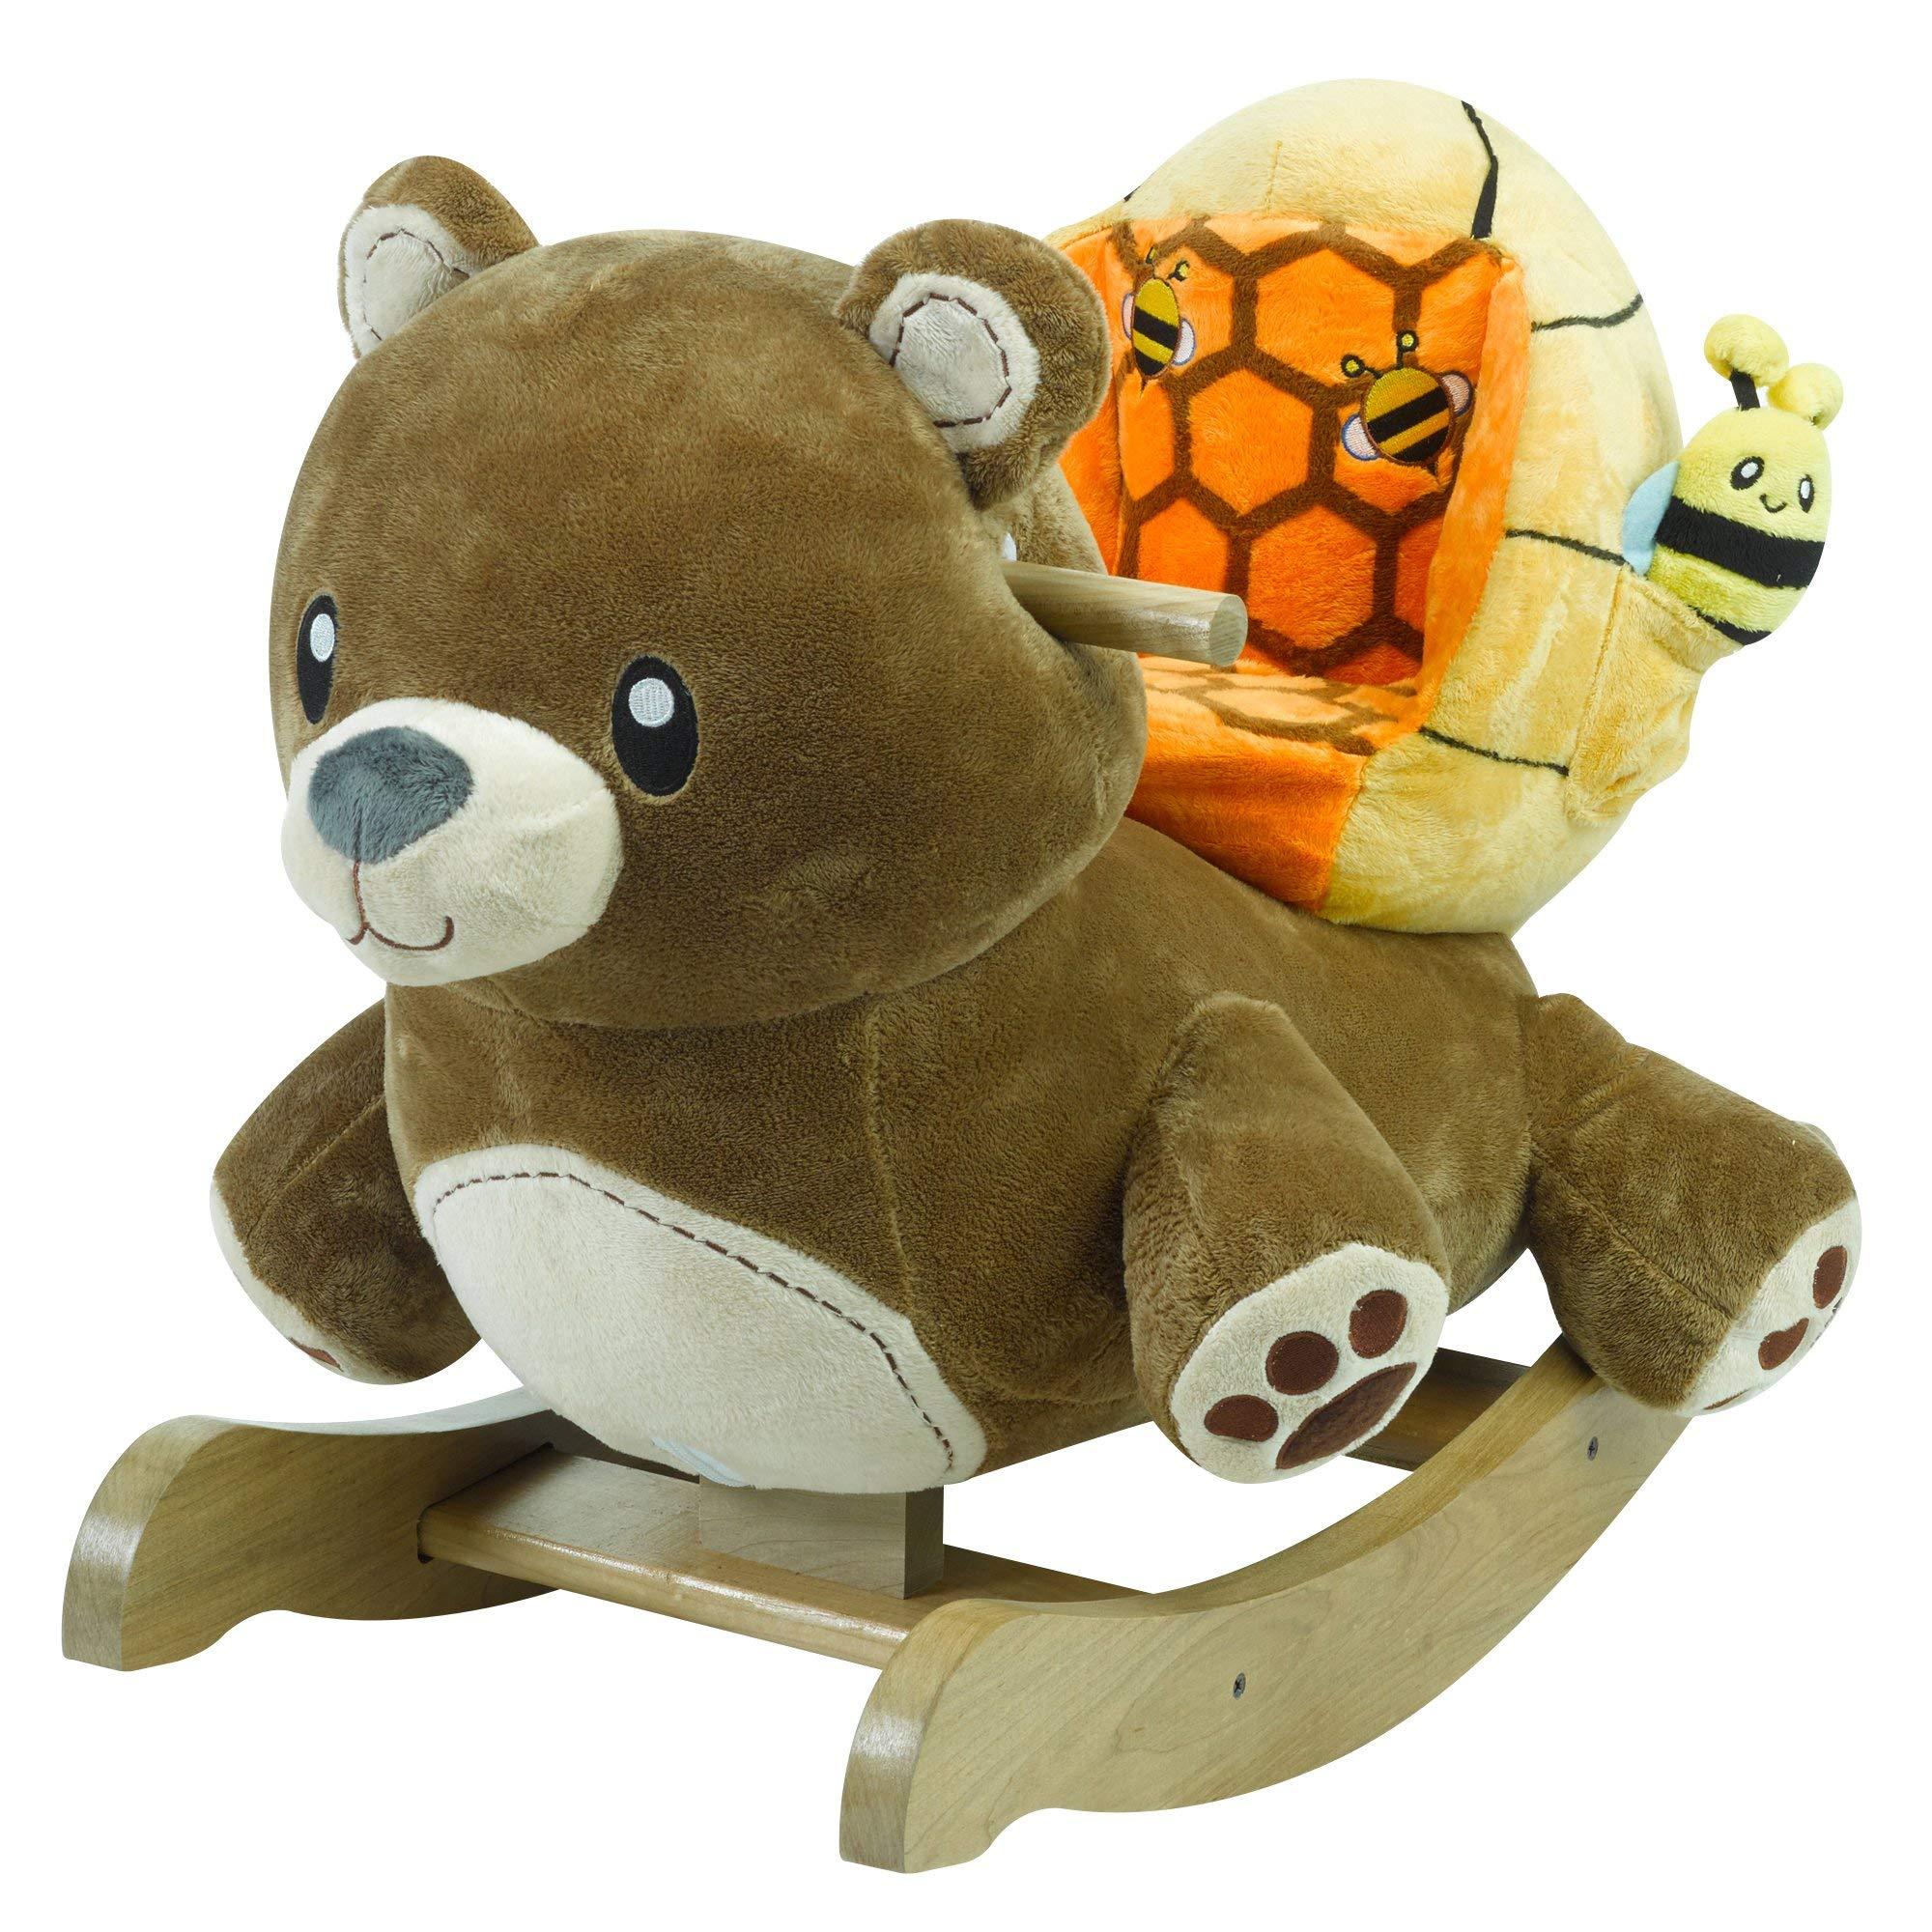 Honey Bear Rocker | Horse Plush Butterfly Baby Toy with Wooden Rocking Chiar Horse/Kid Rocking Toy/Baby Rocking Horse/Rocker/Animal Ride